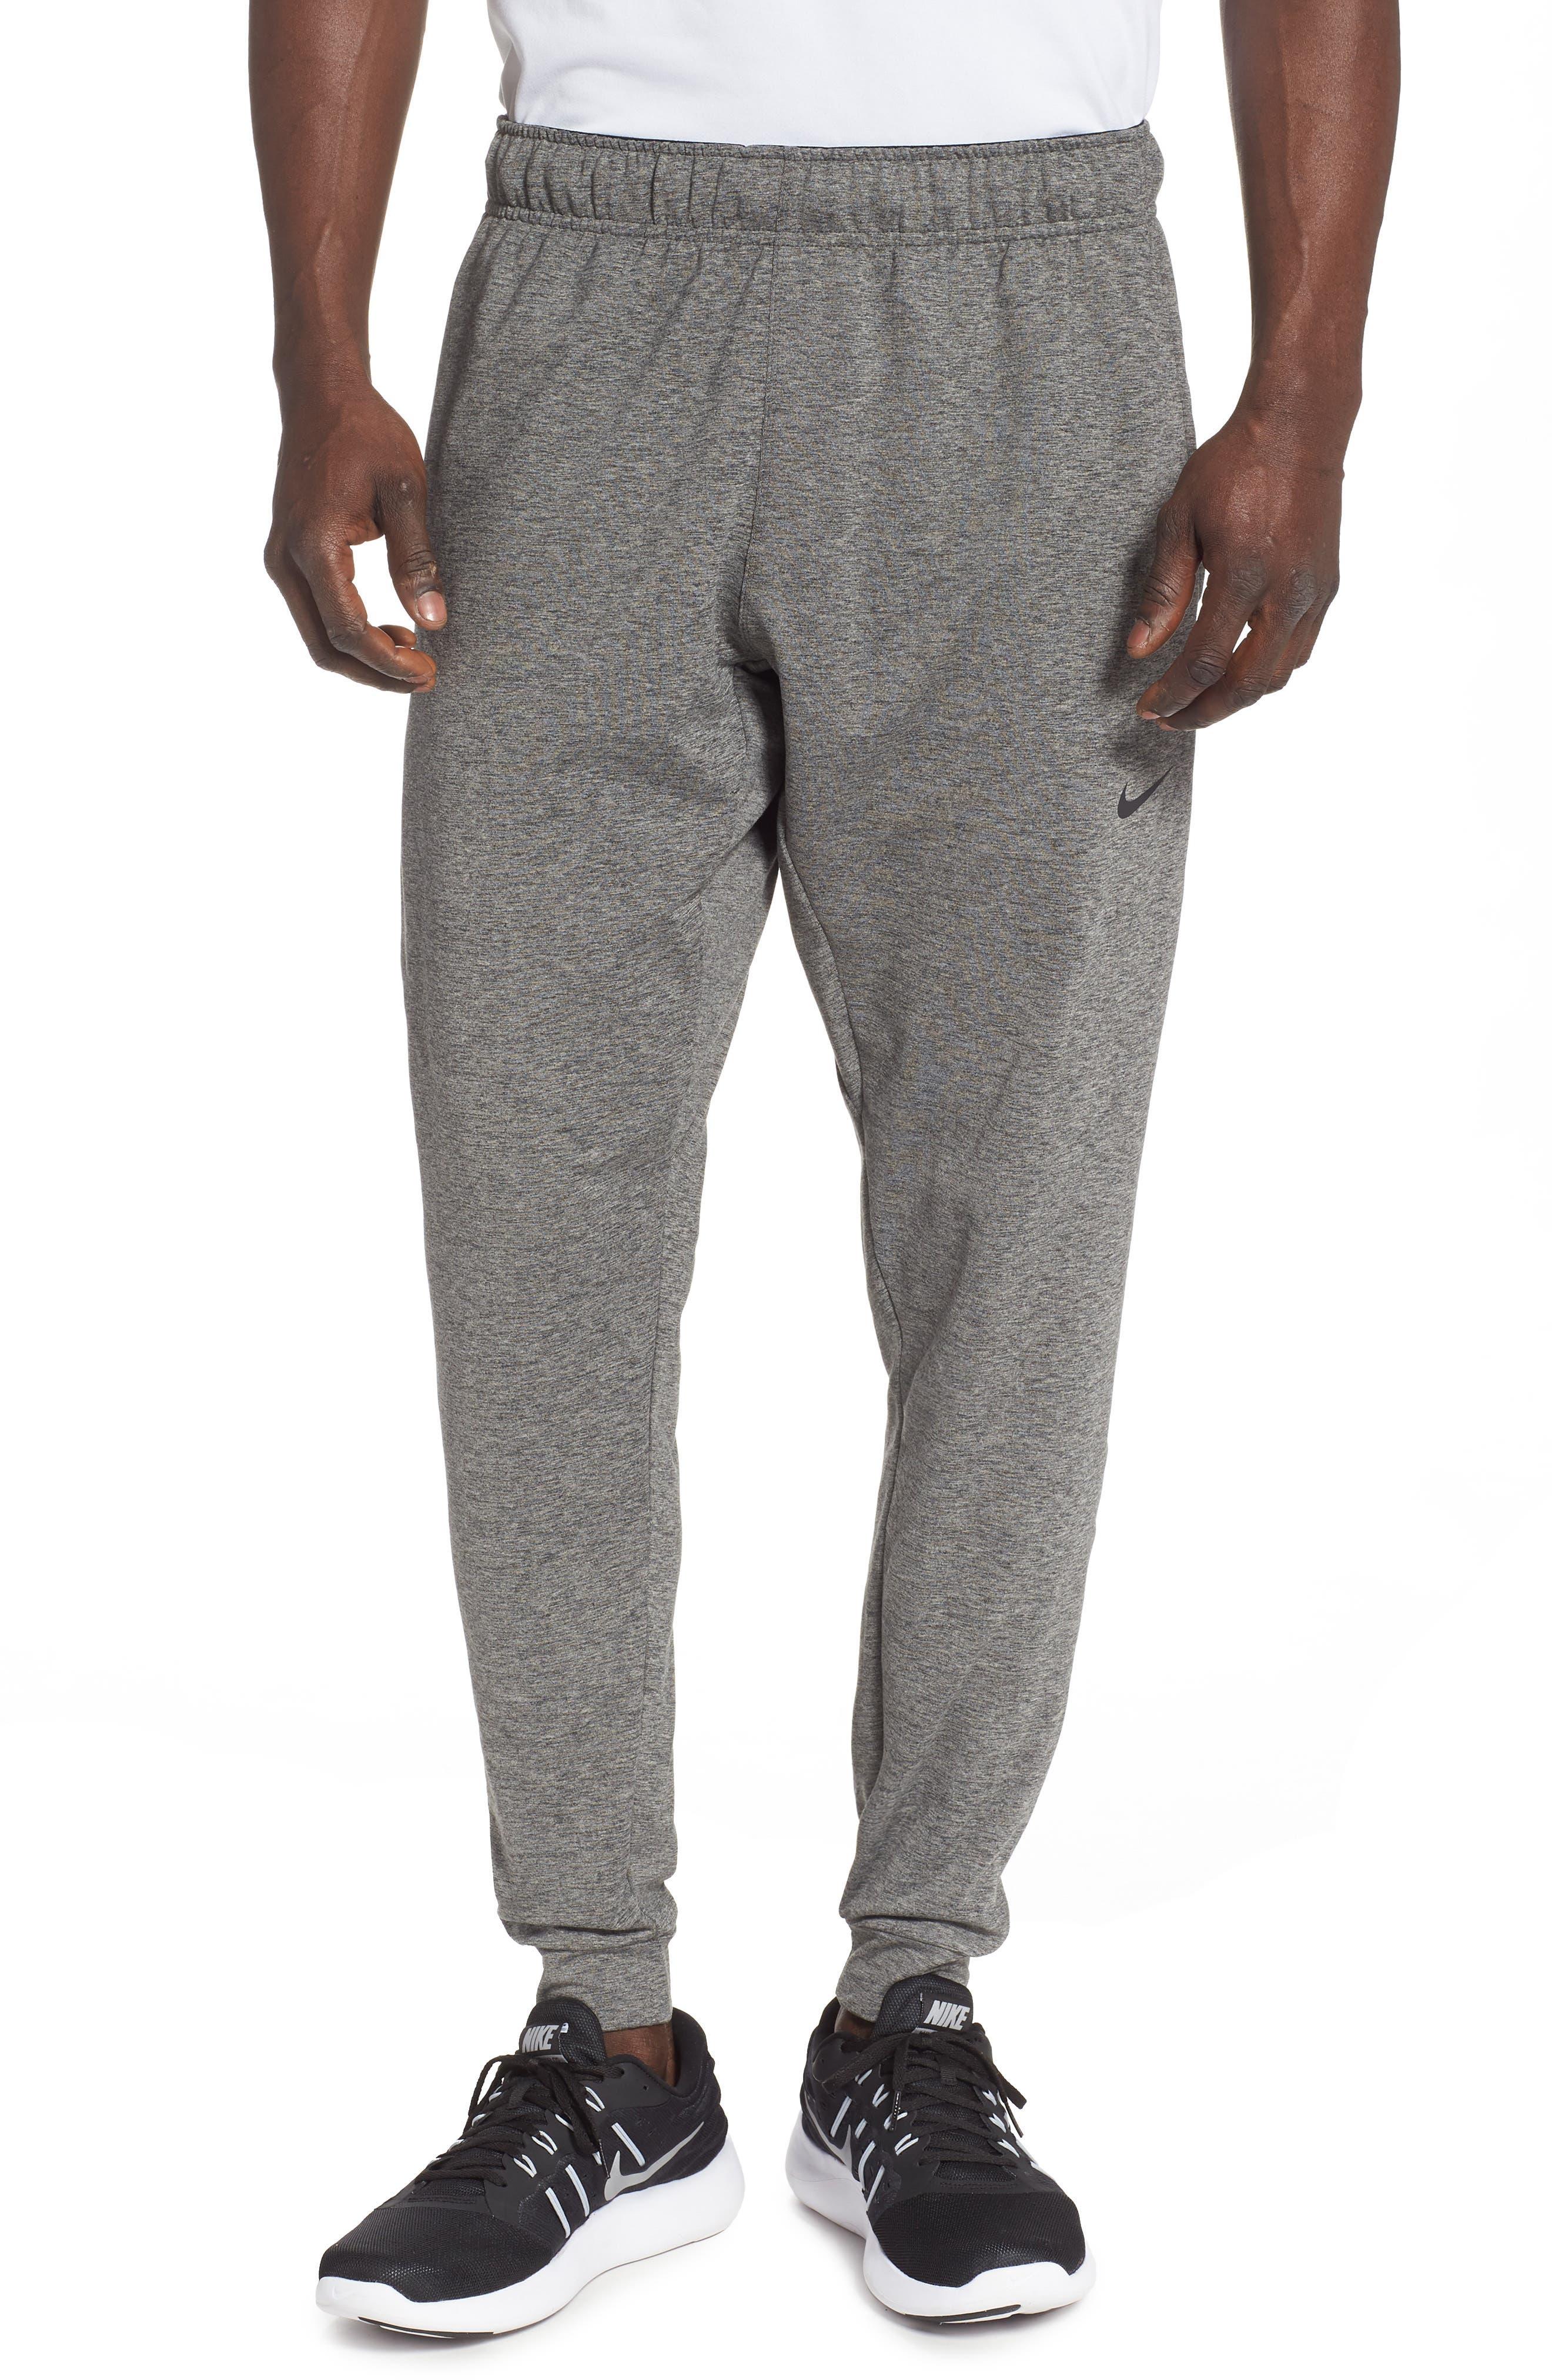 Transcend Dry Yoga Training Pants, Main, color, BLACK/ HEATHER/ BLACK